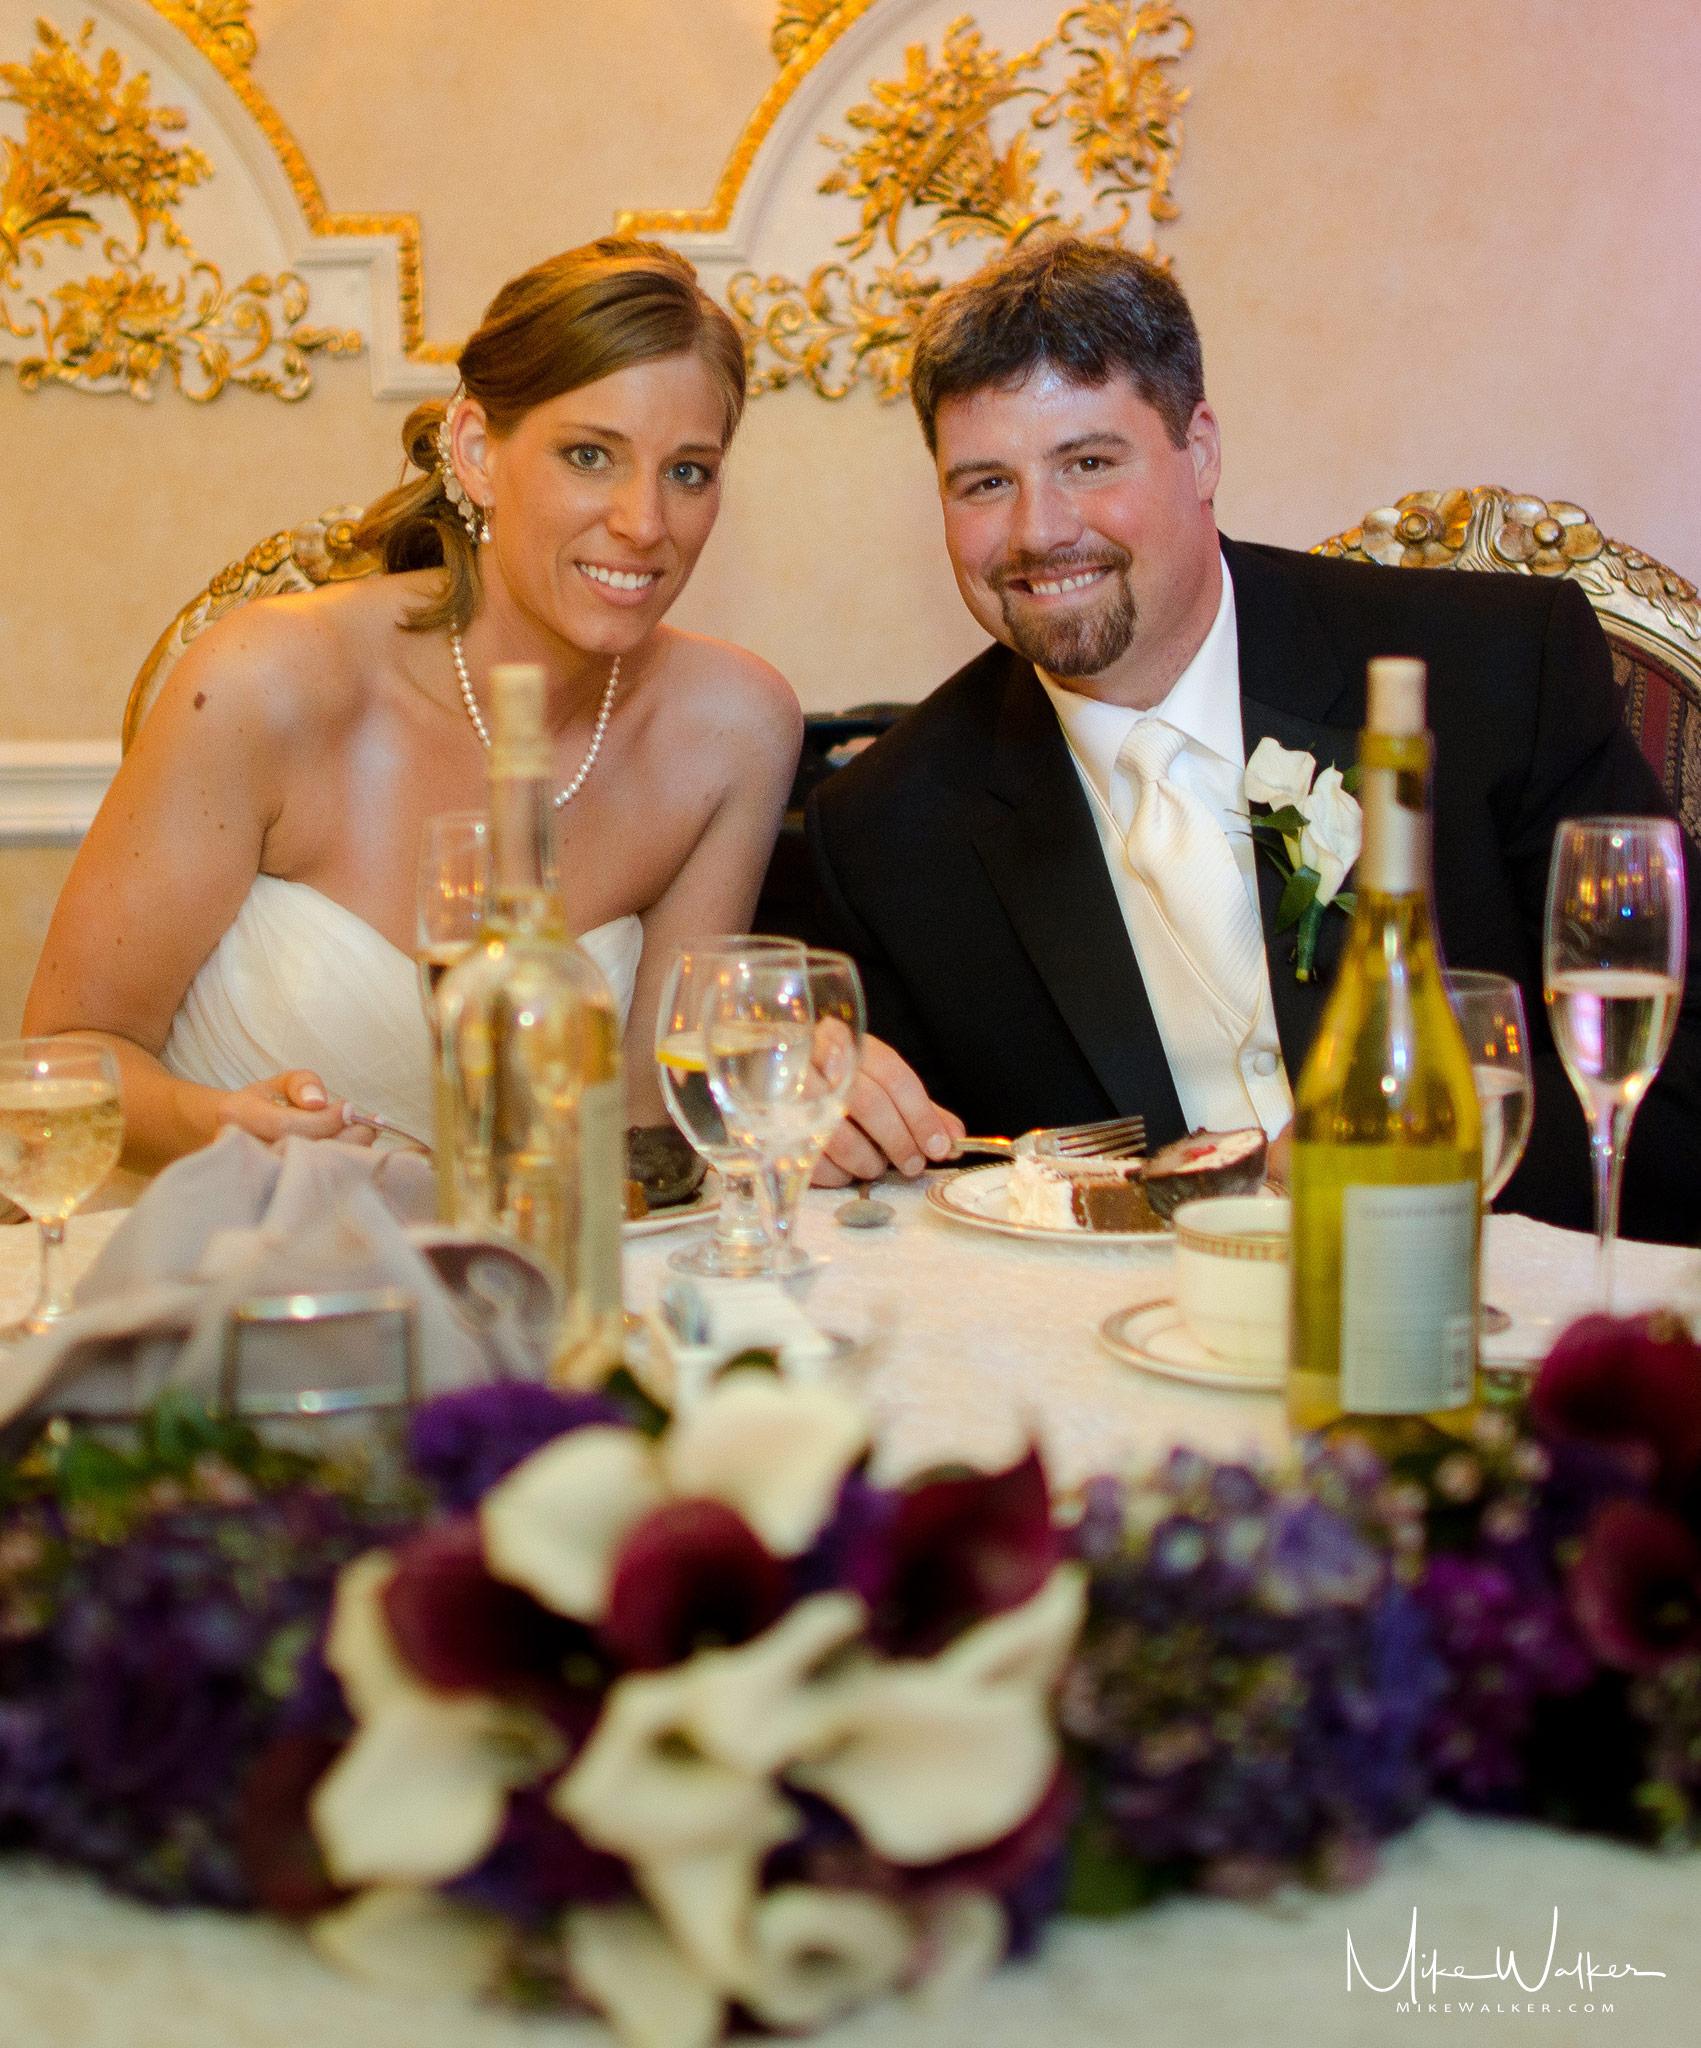 Wedding couple at head table. Wedding photographer - Mike Walker.